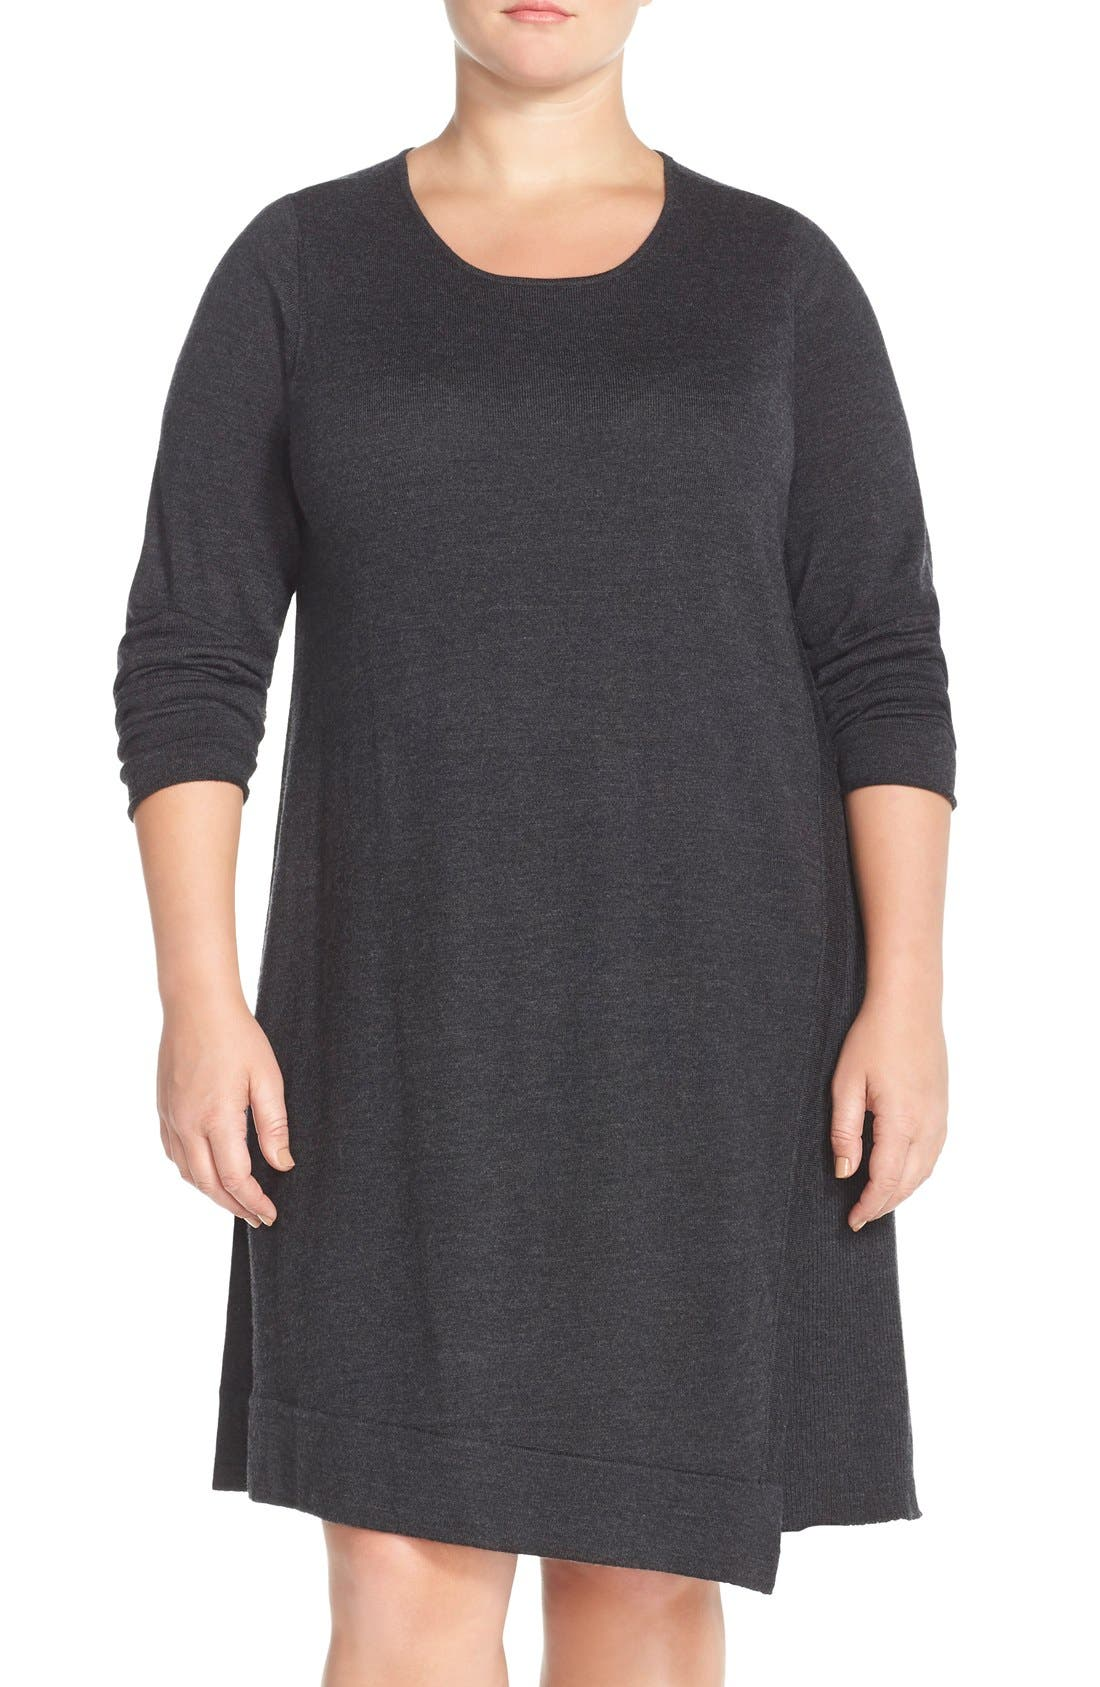 Main Image - Eileen Fisher Merino Jersey Jewel Neck Dress (Plus Size)